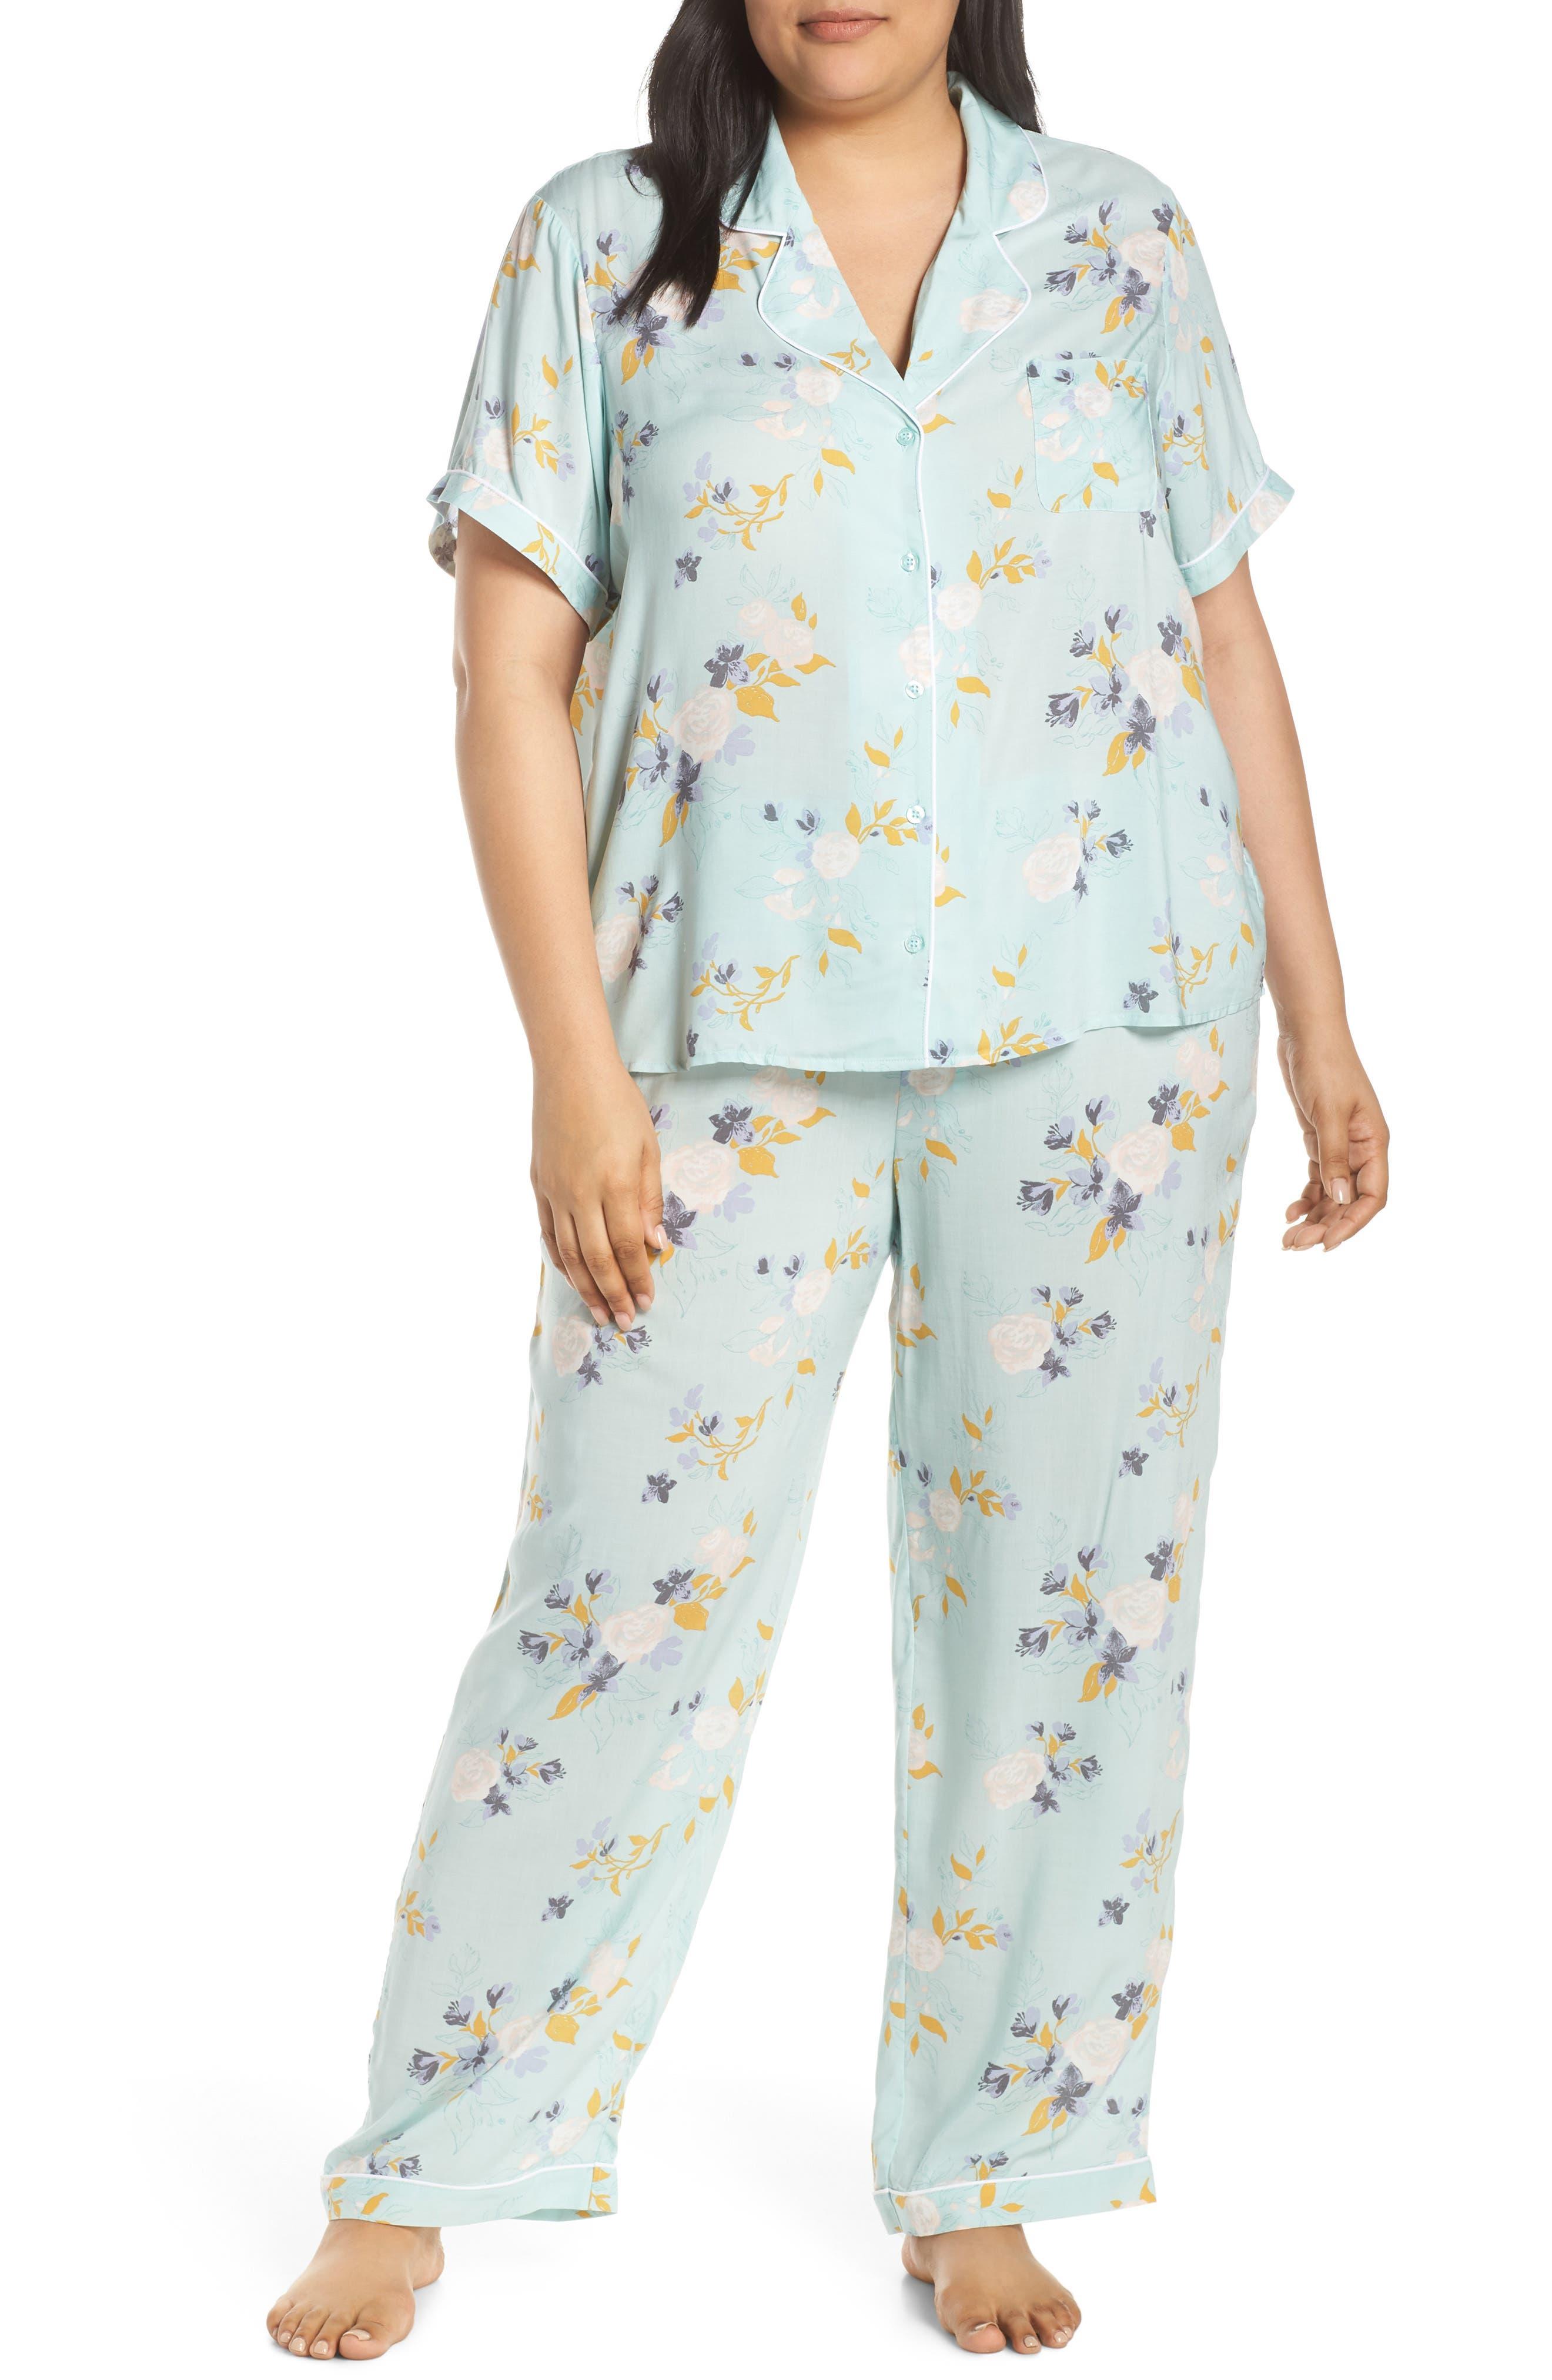 Plus Size Nordstrom Lingerie Sweet Dreams Pajamas, Blue/green